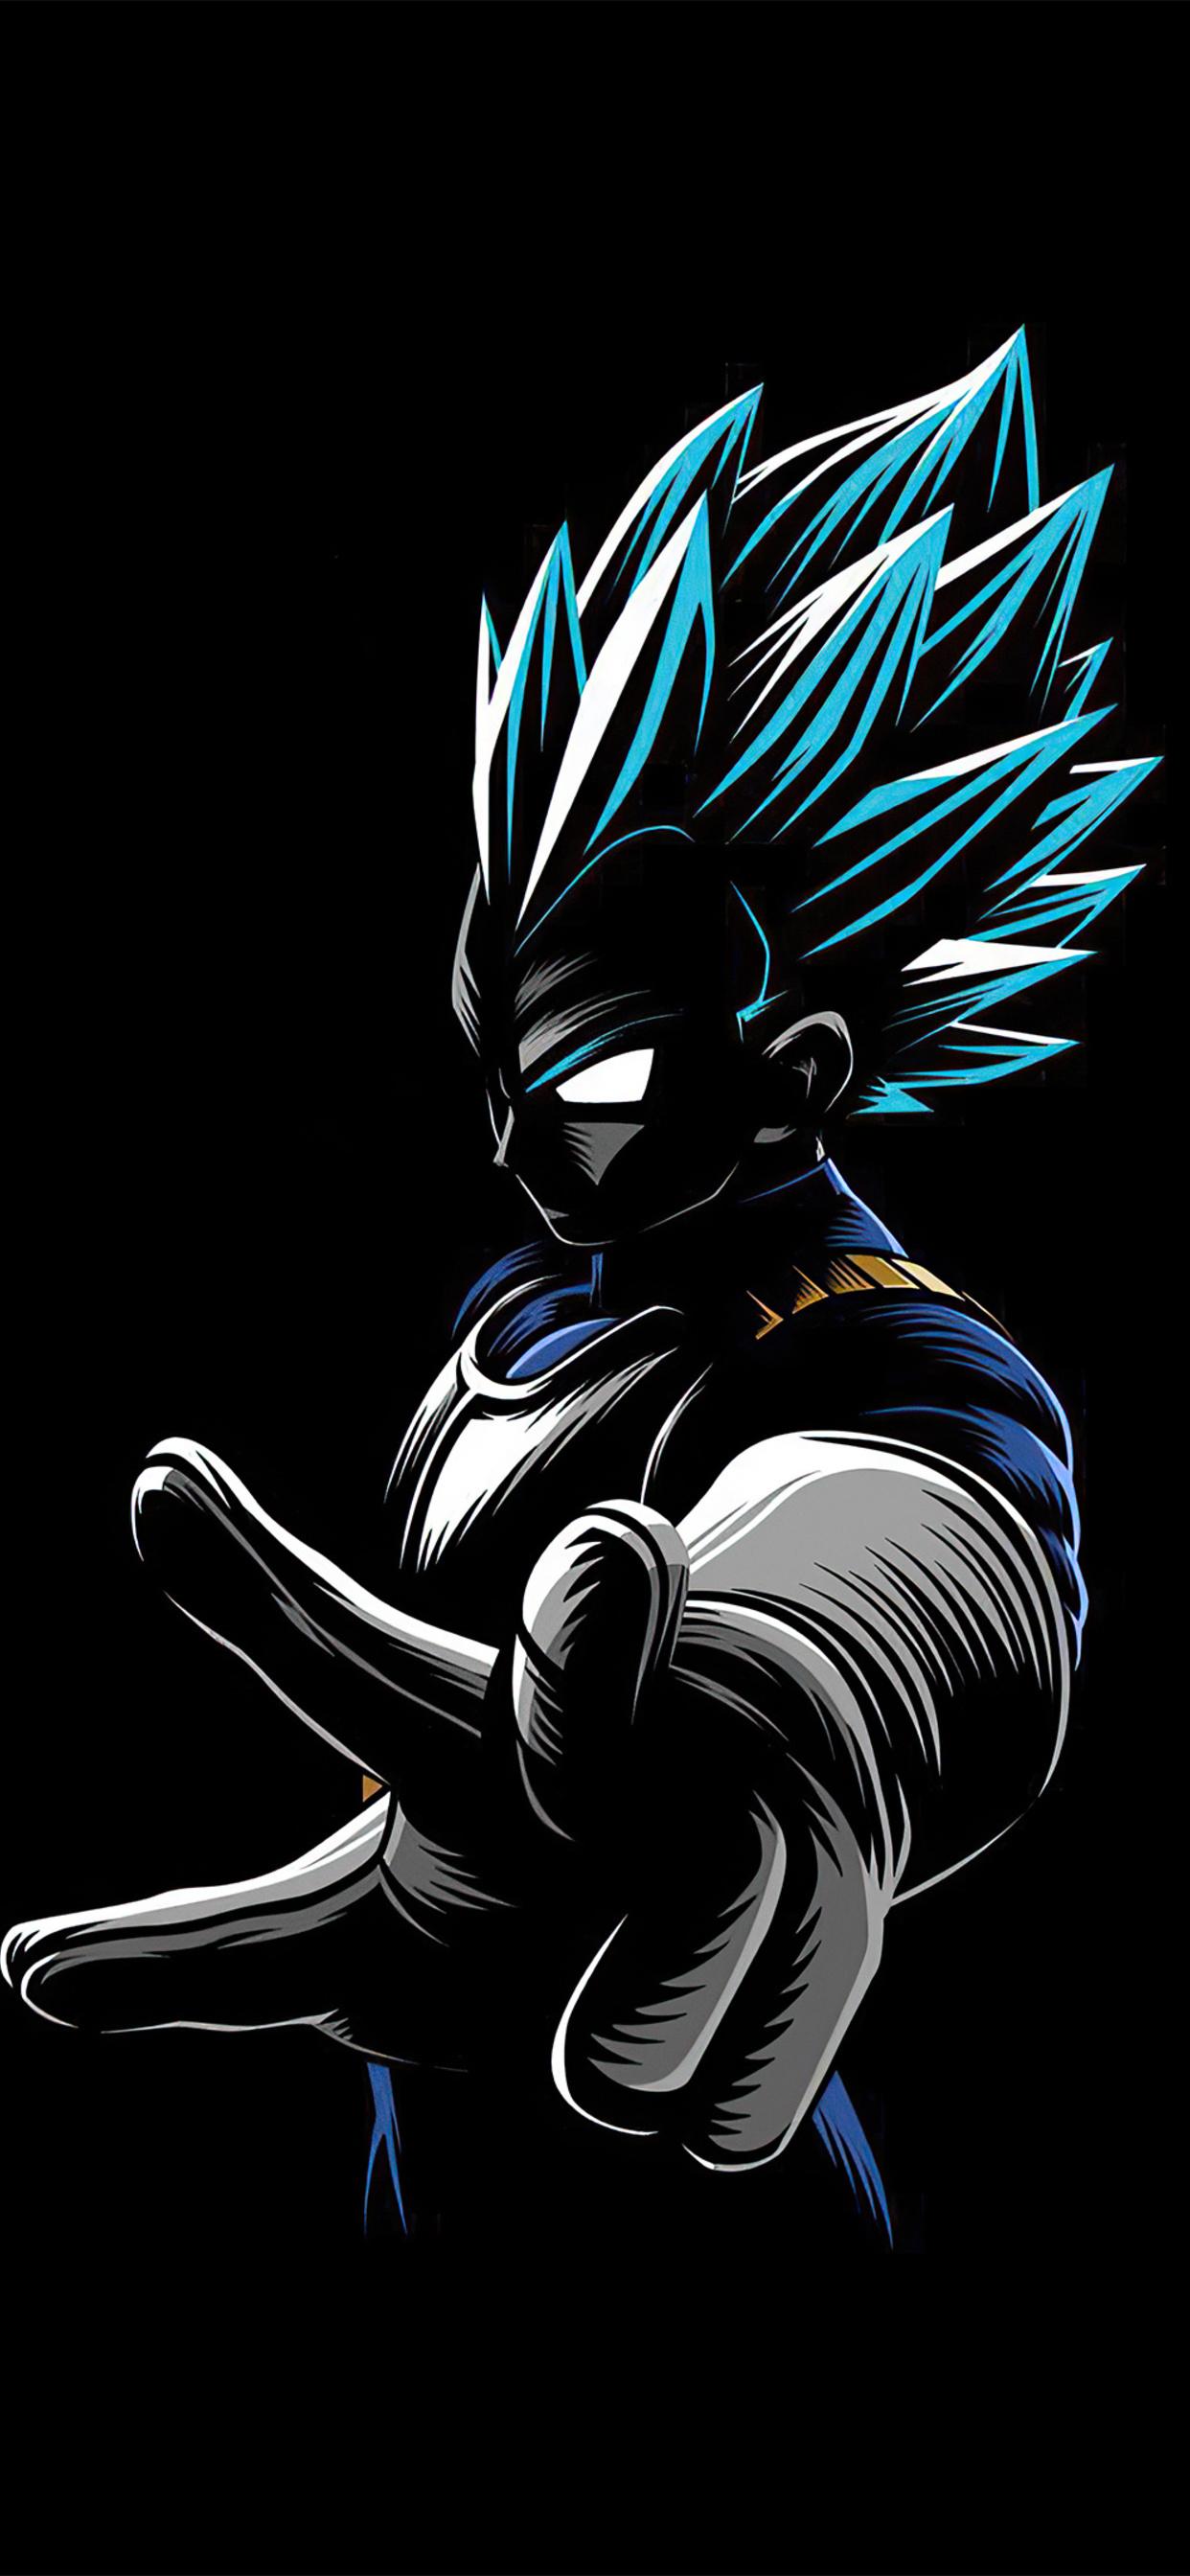 1242x2688 Anime Goku 4k Iphone XS MAX HD 4k Wallpapers ...